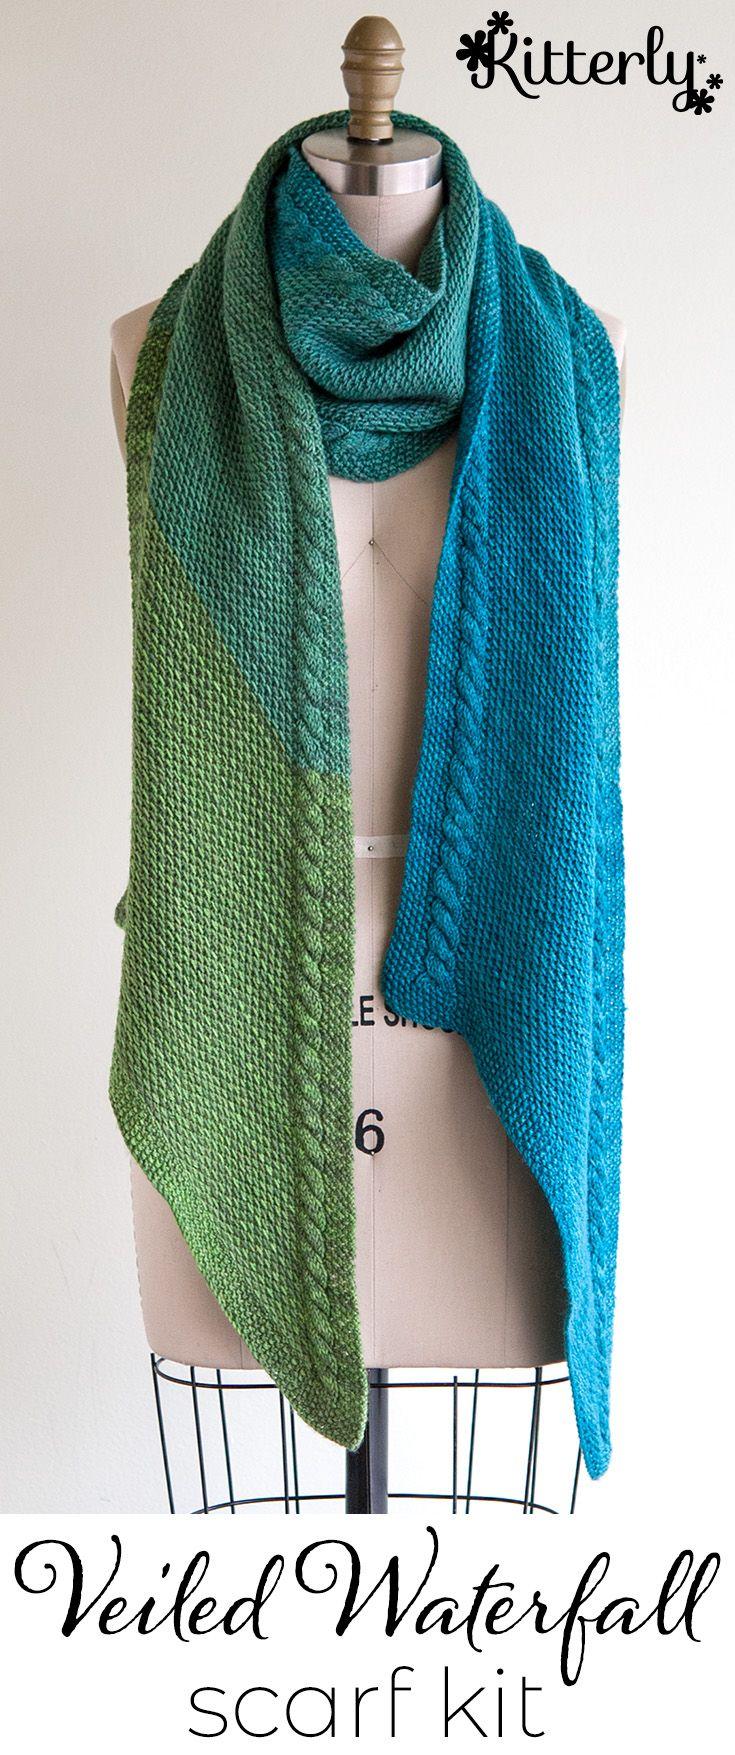 Wonderland Yarns Veiled Waterfall Shawl Kit - Pattern Free With Kit ...